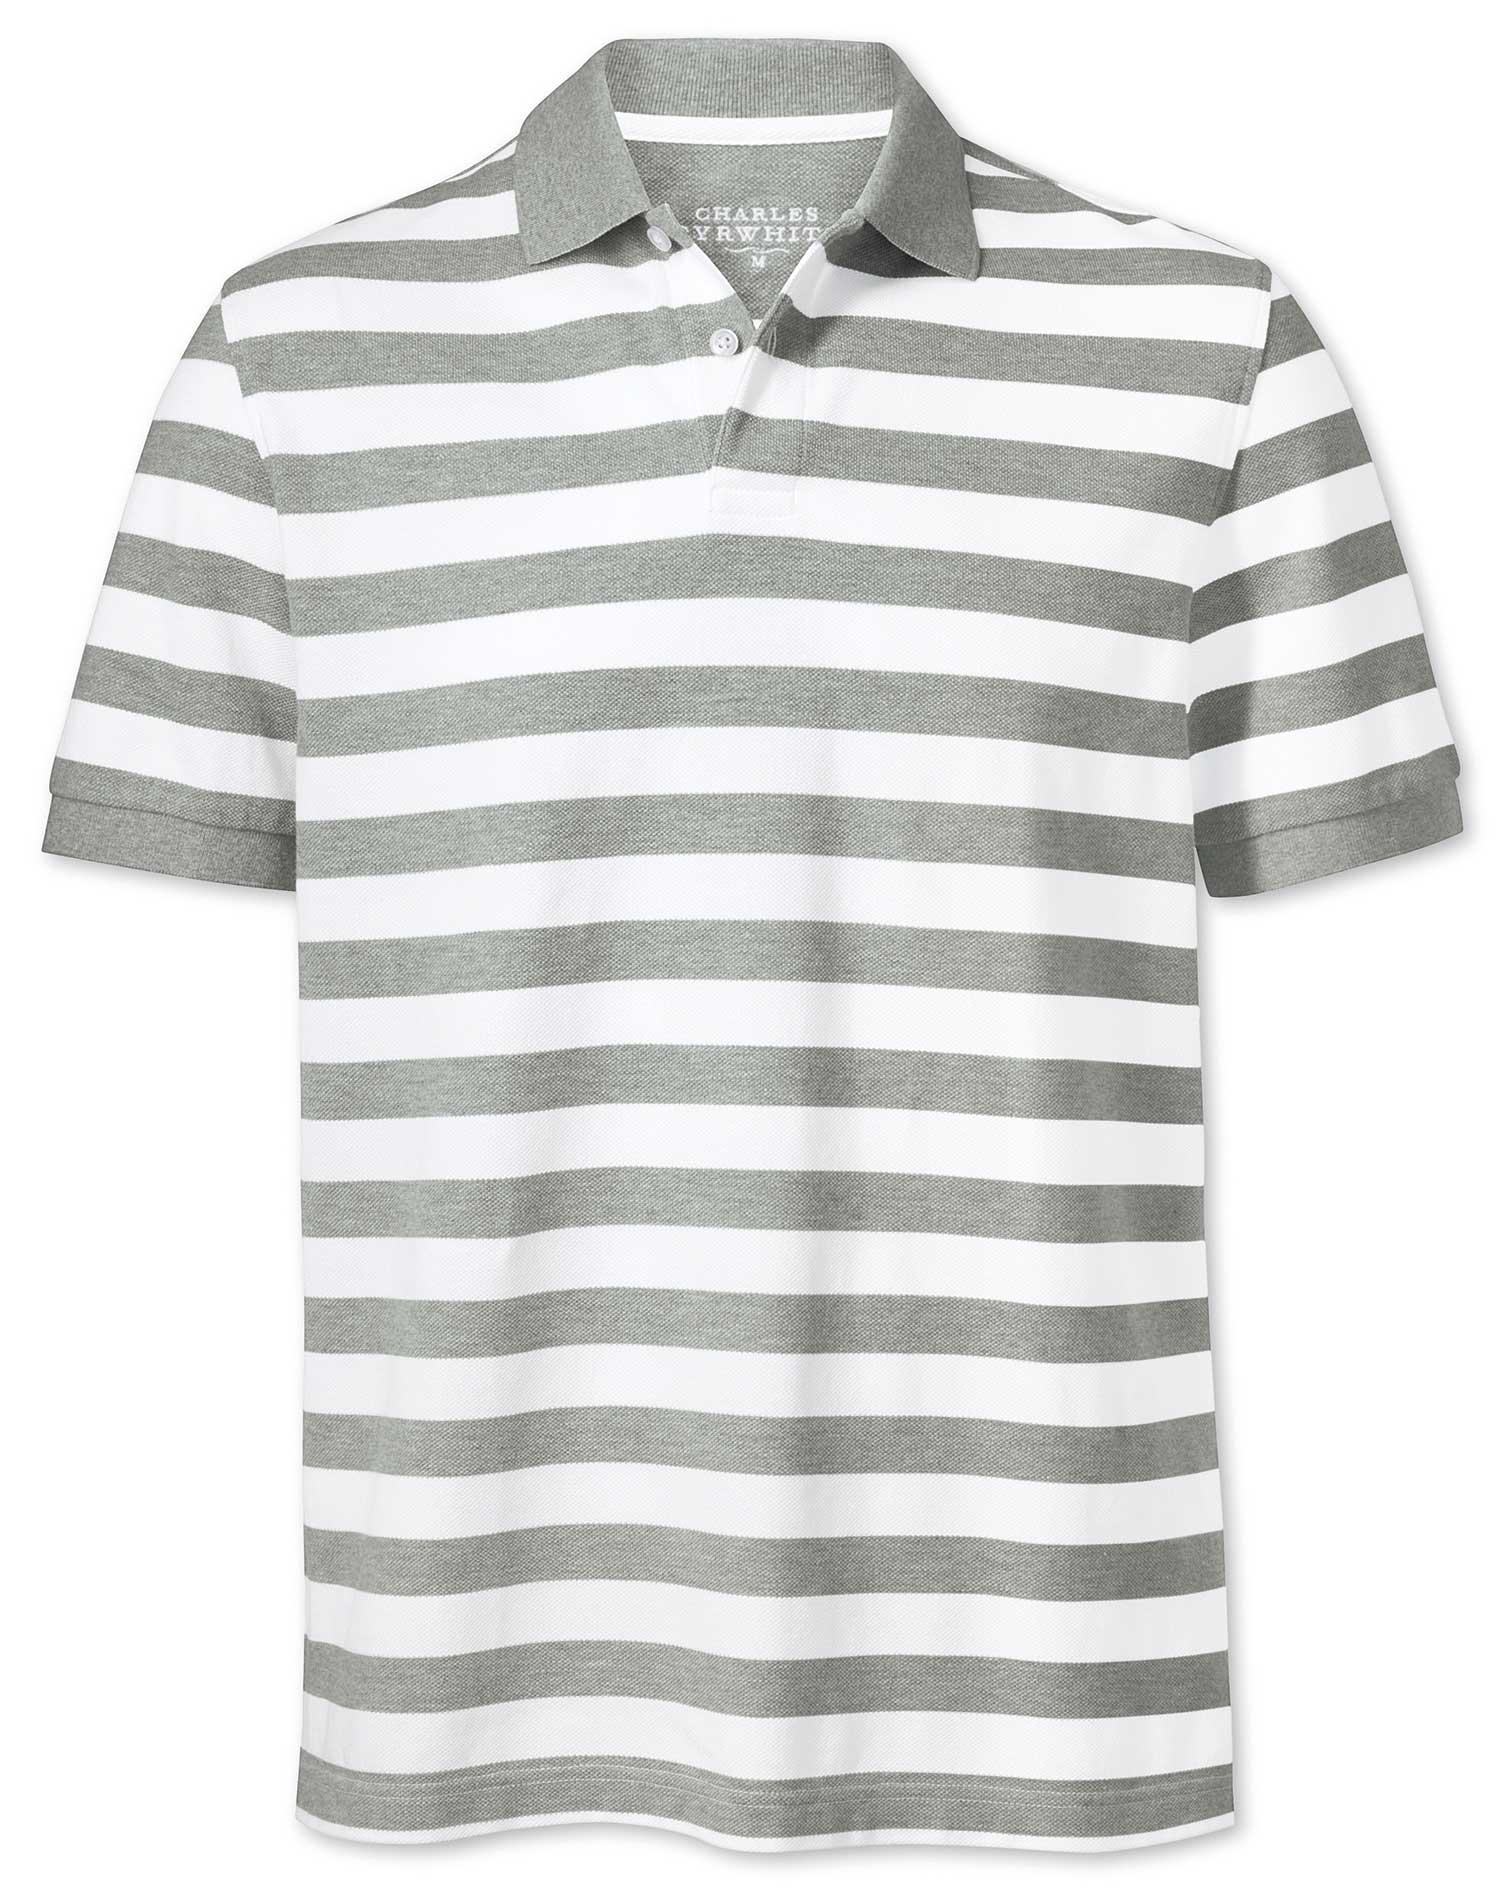 Grey and White Stripe Pique Cotton Polo Size XS by Charles Tyrwhitt